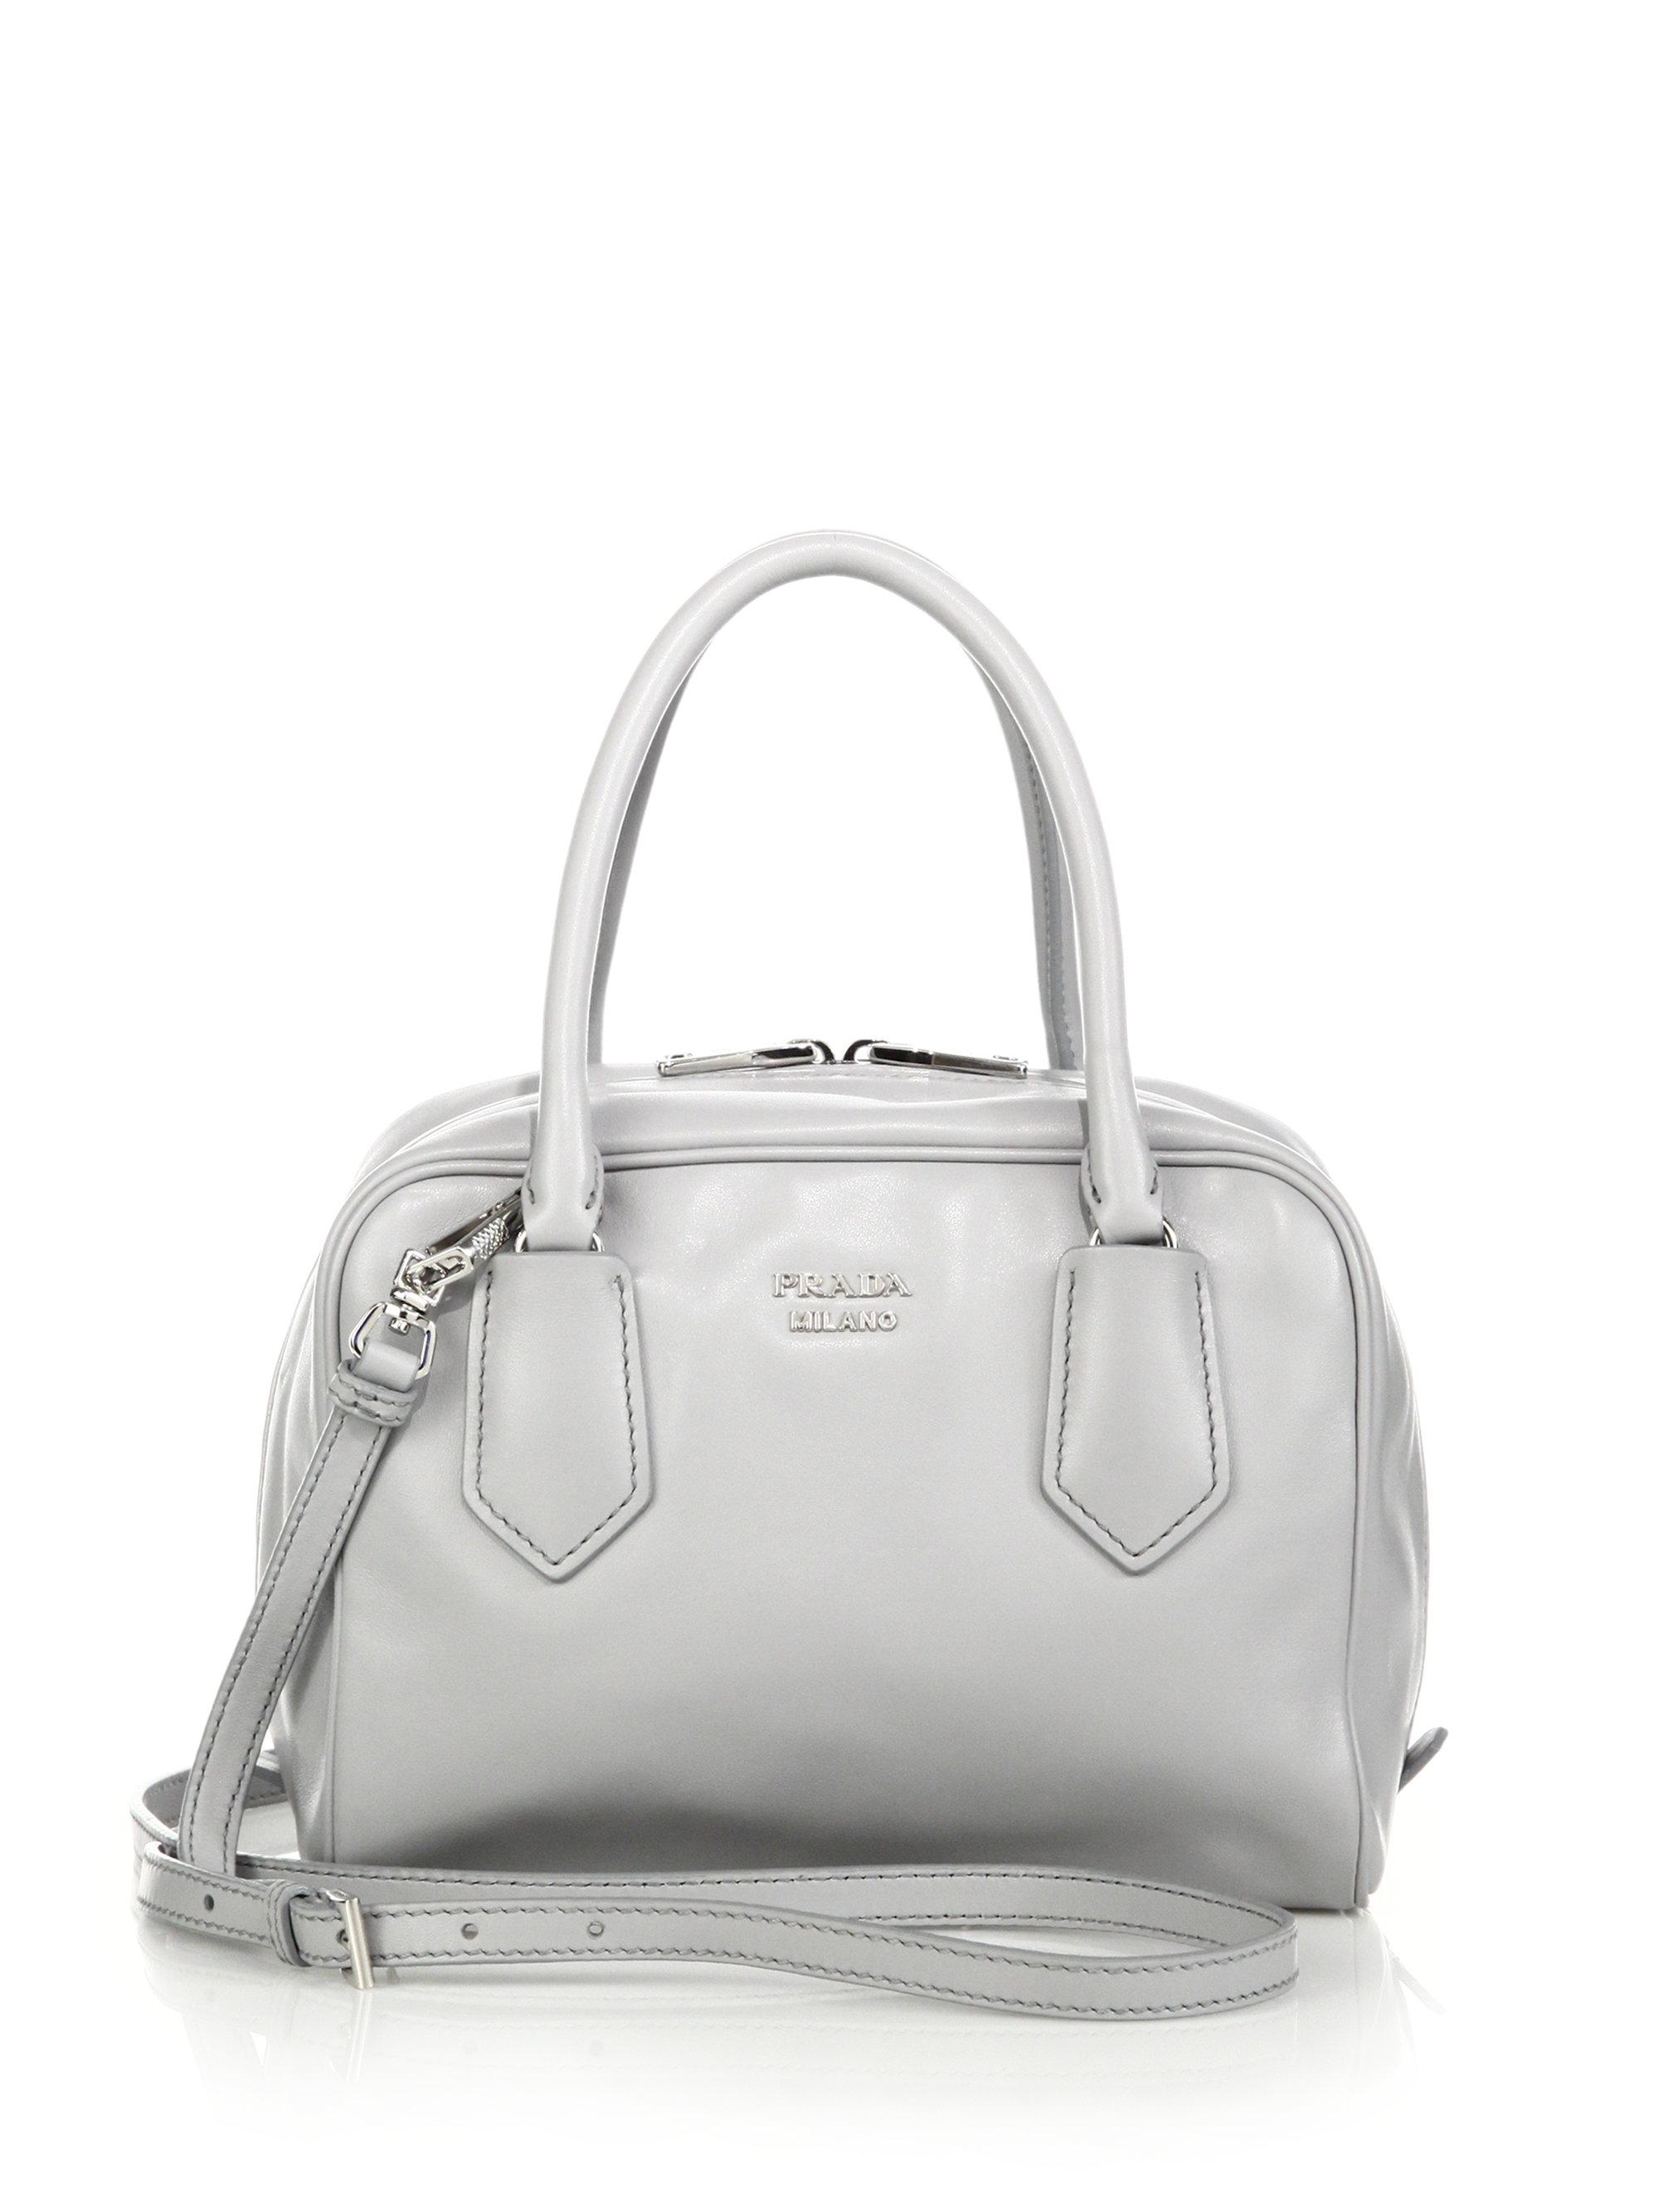 3eda63571c8 Prada Small Soft Calf Inside Bag in Gray - Lyst